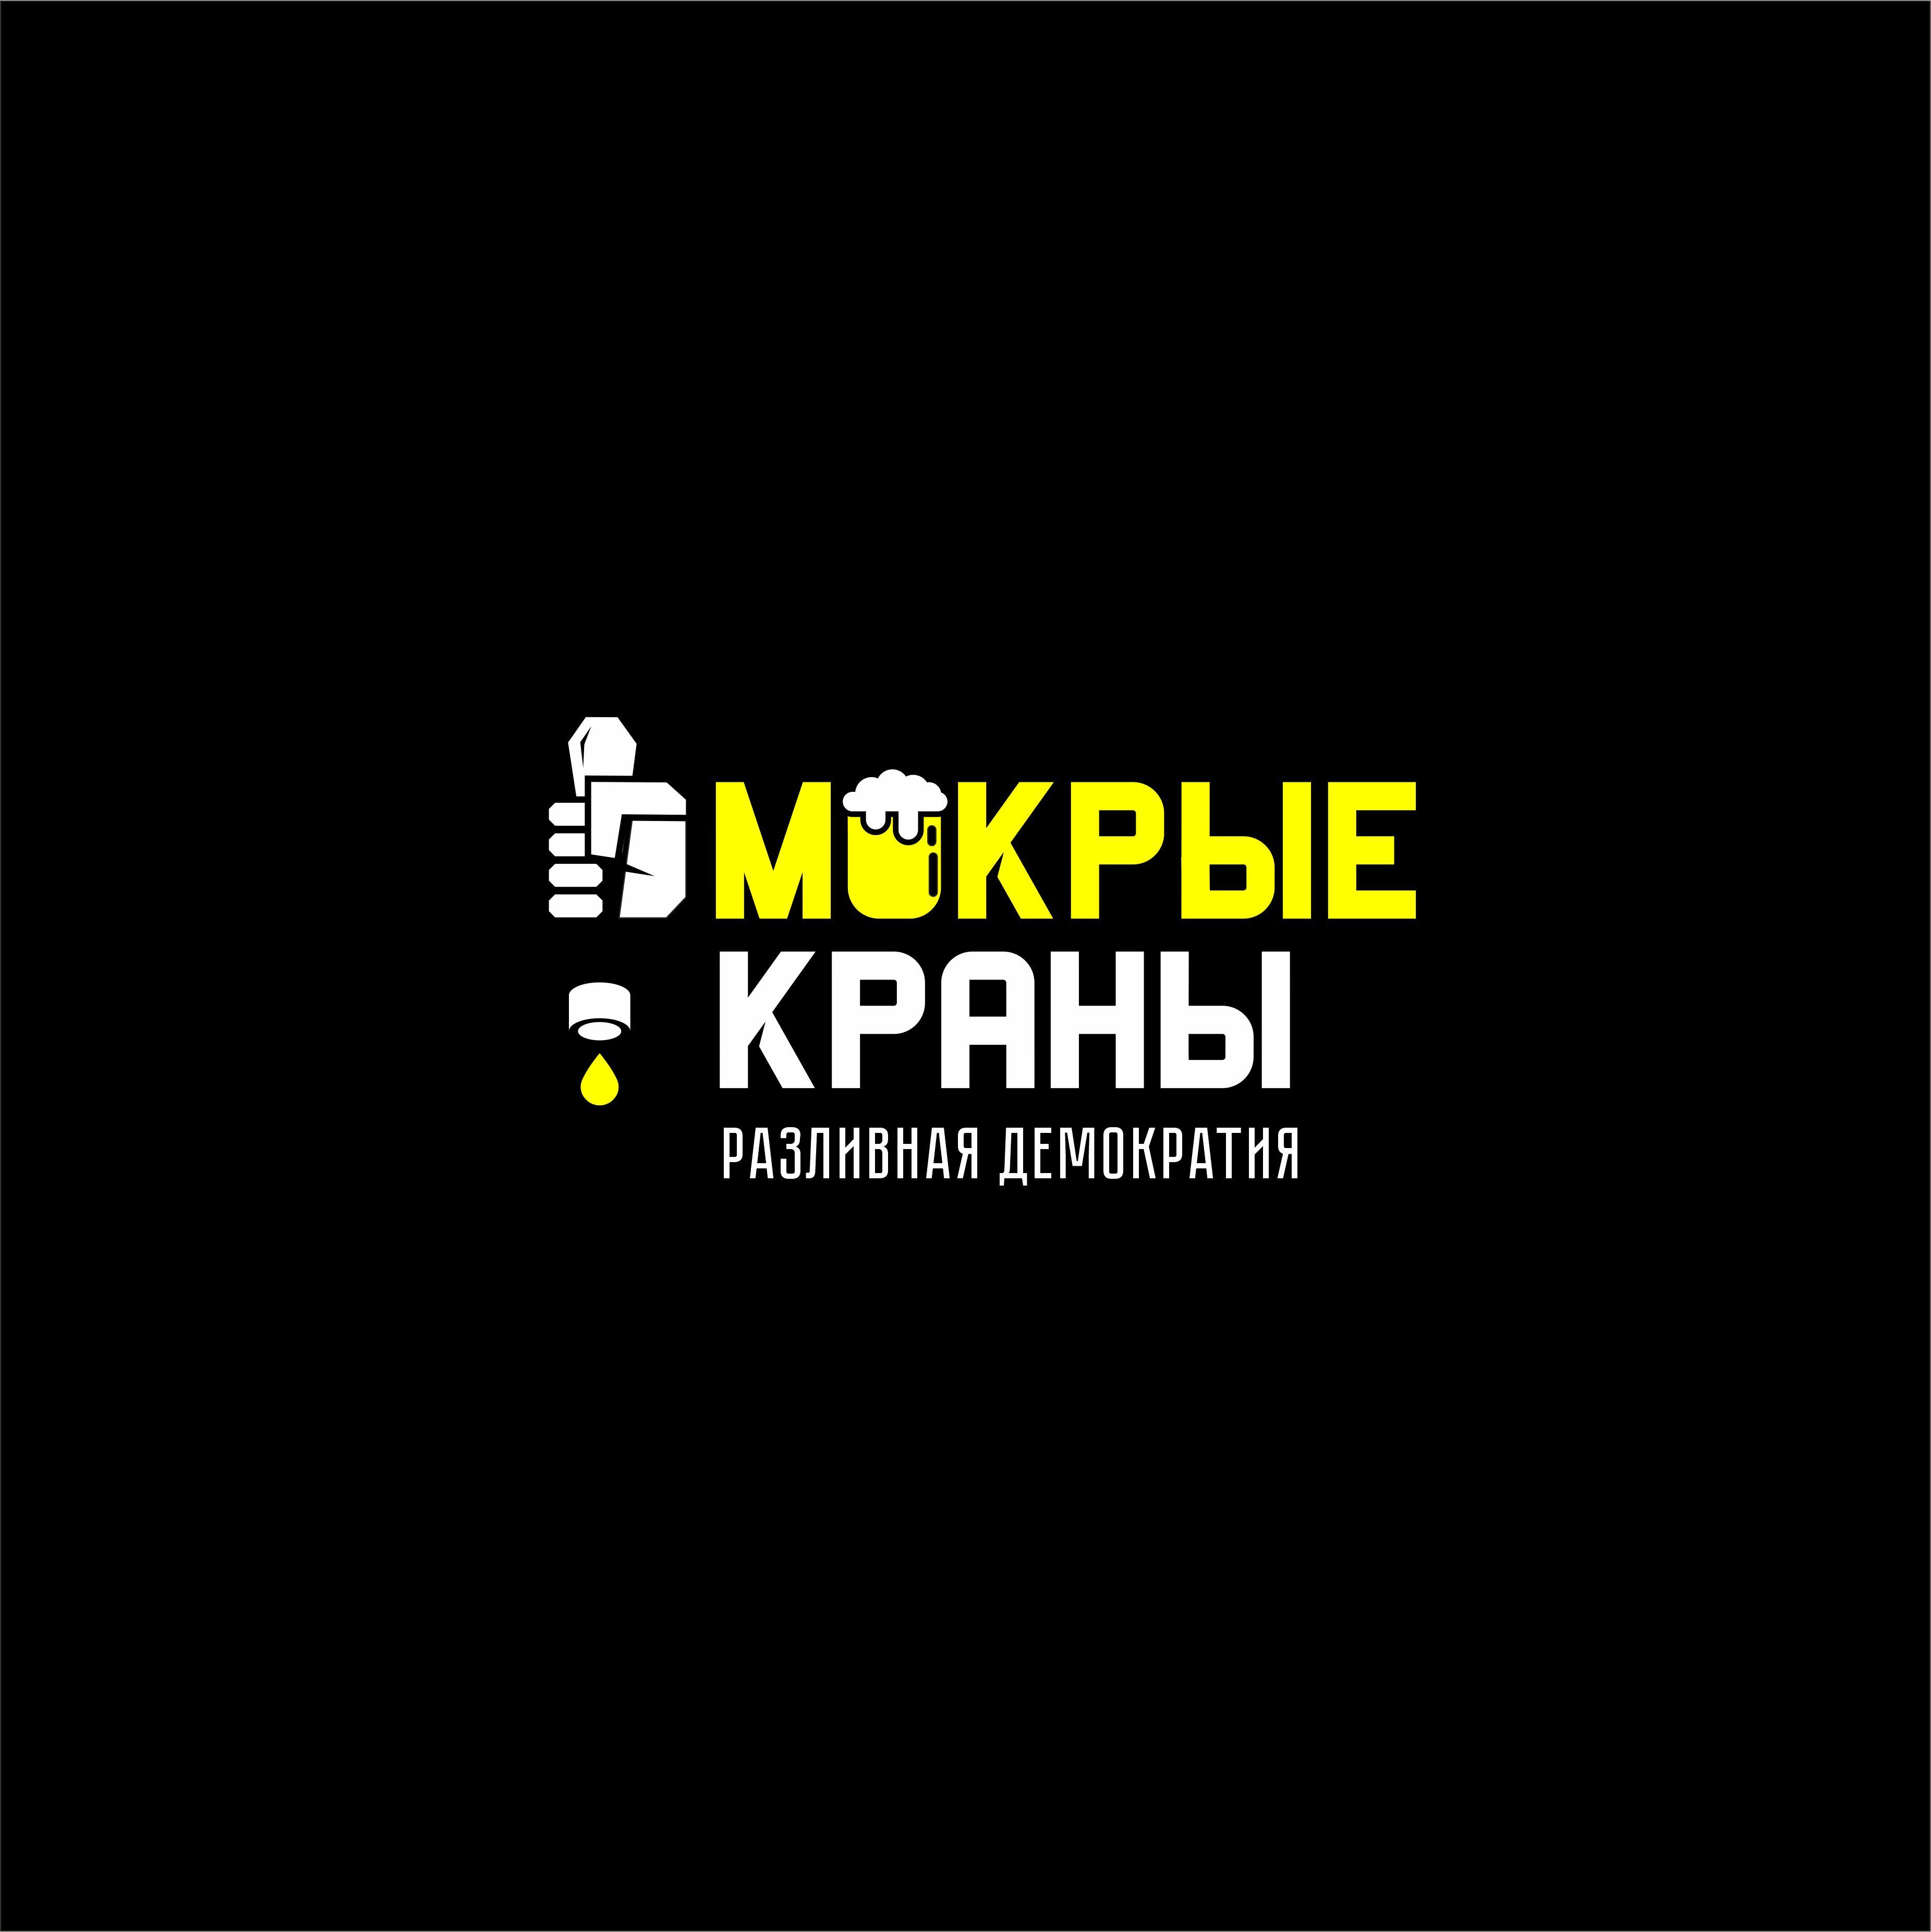 Вывеска/логотип для пивного магазина фото f_394601ec9db9c5e5.jpg